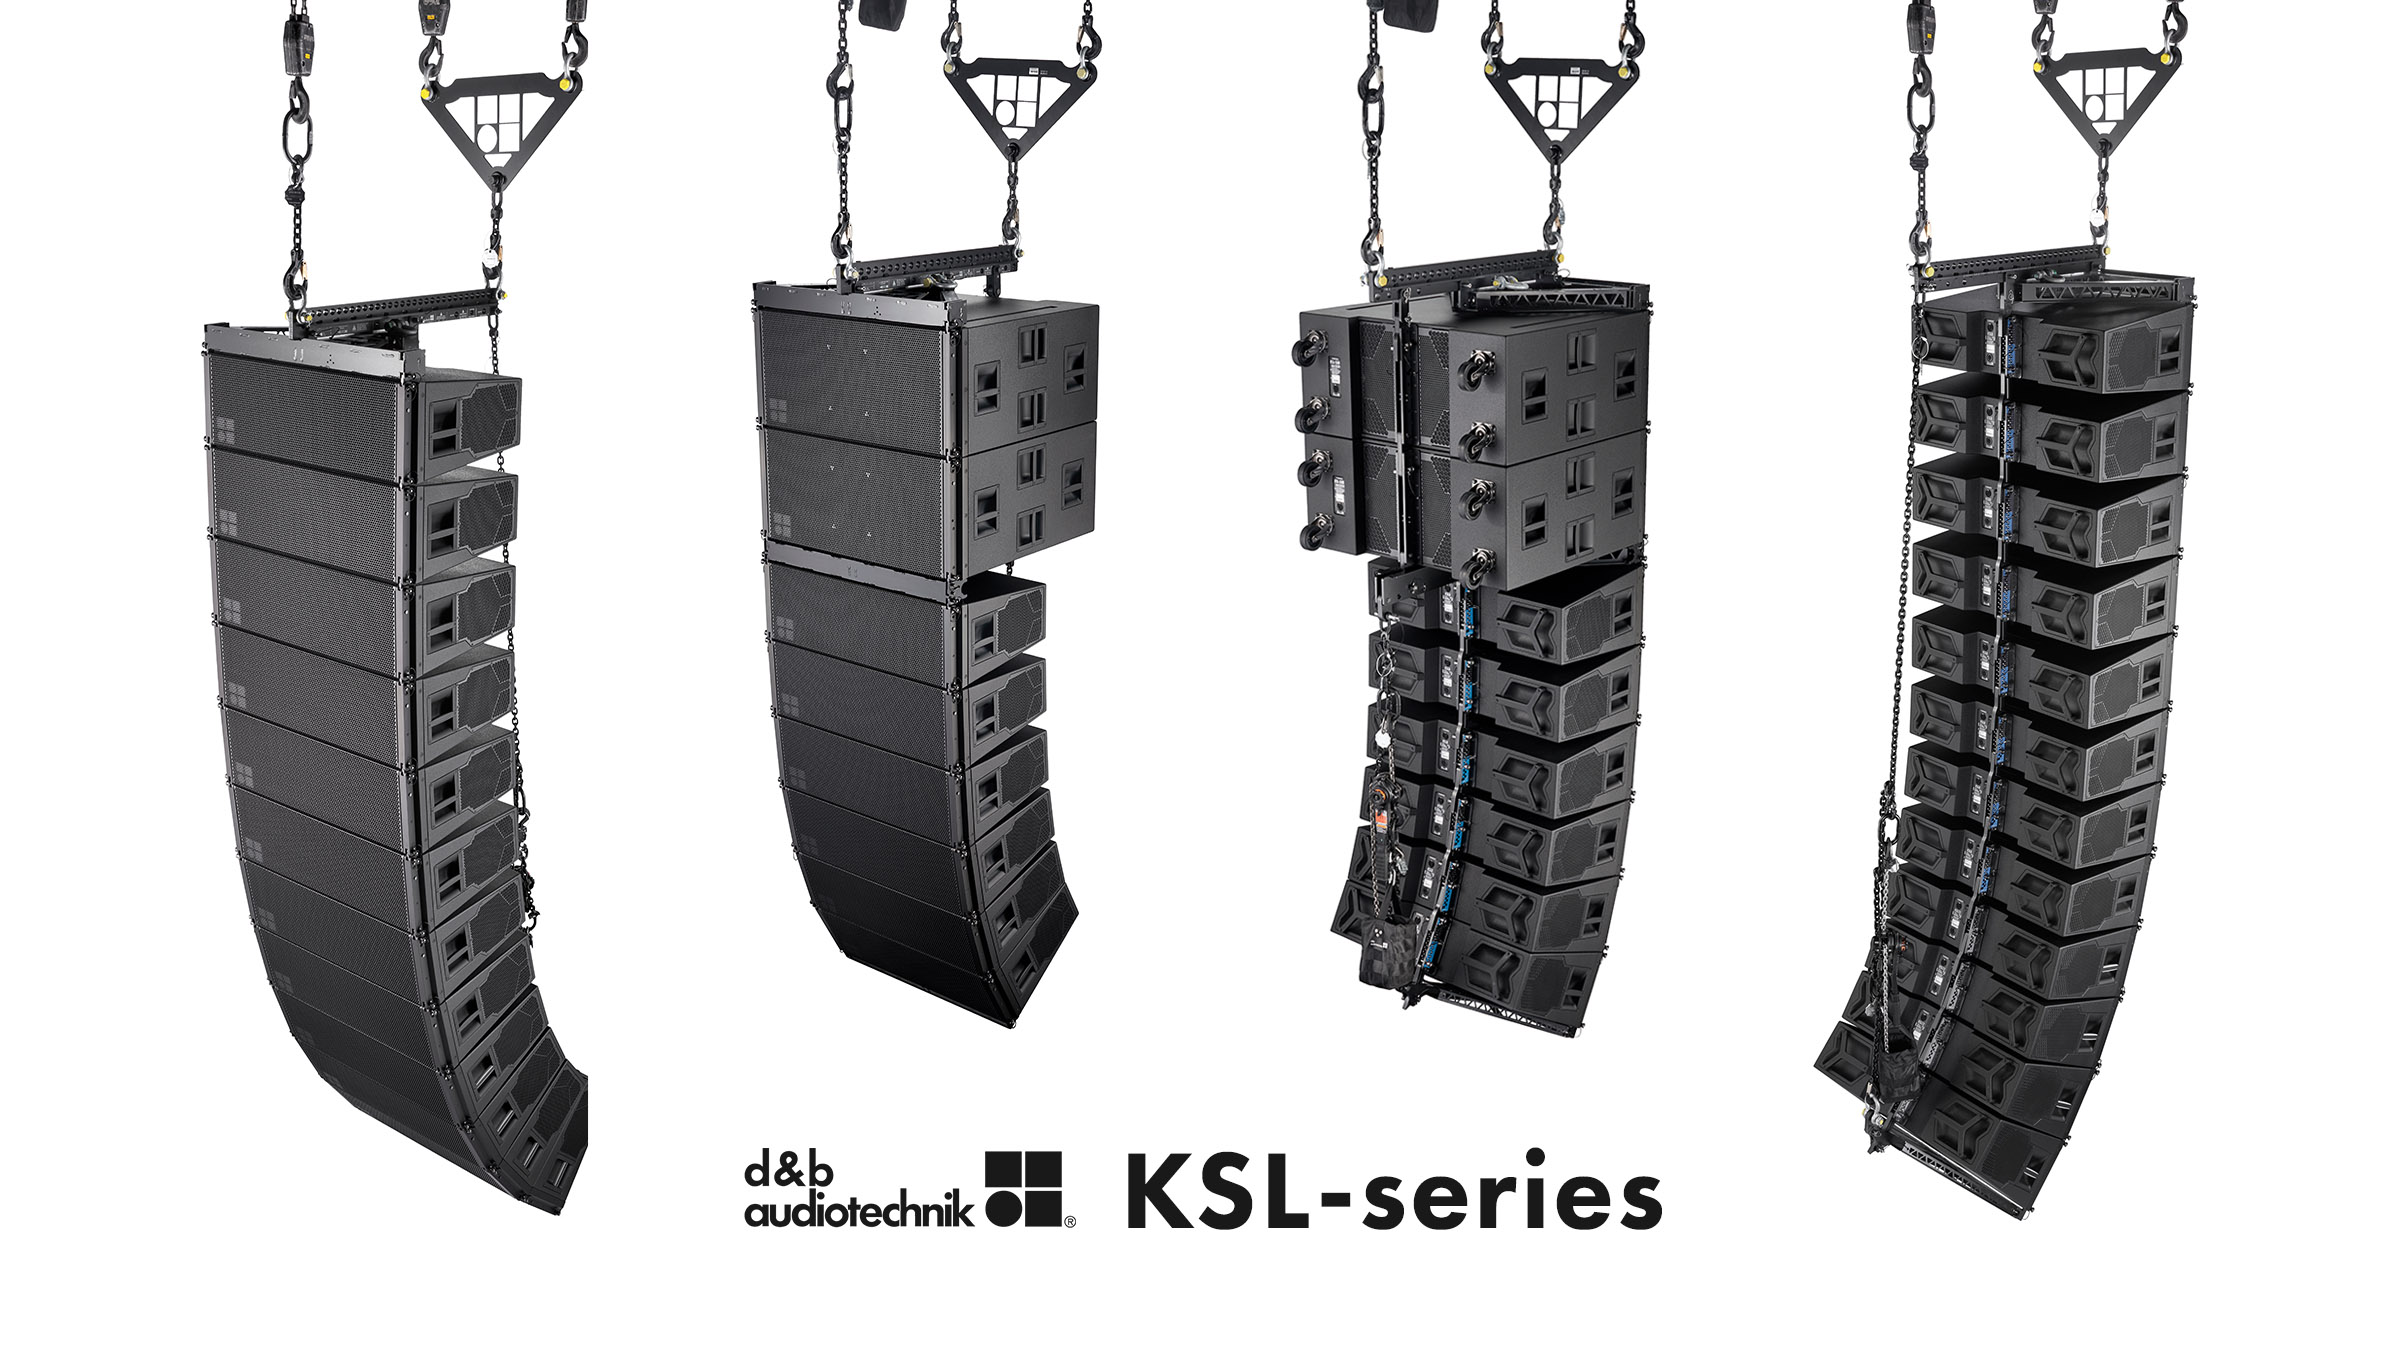 d&b audiotechnik КSL-series